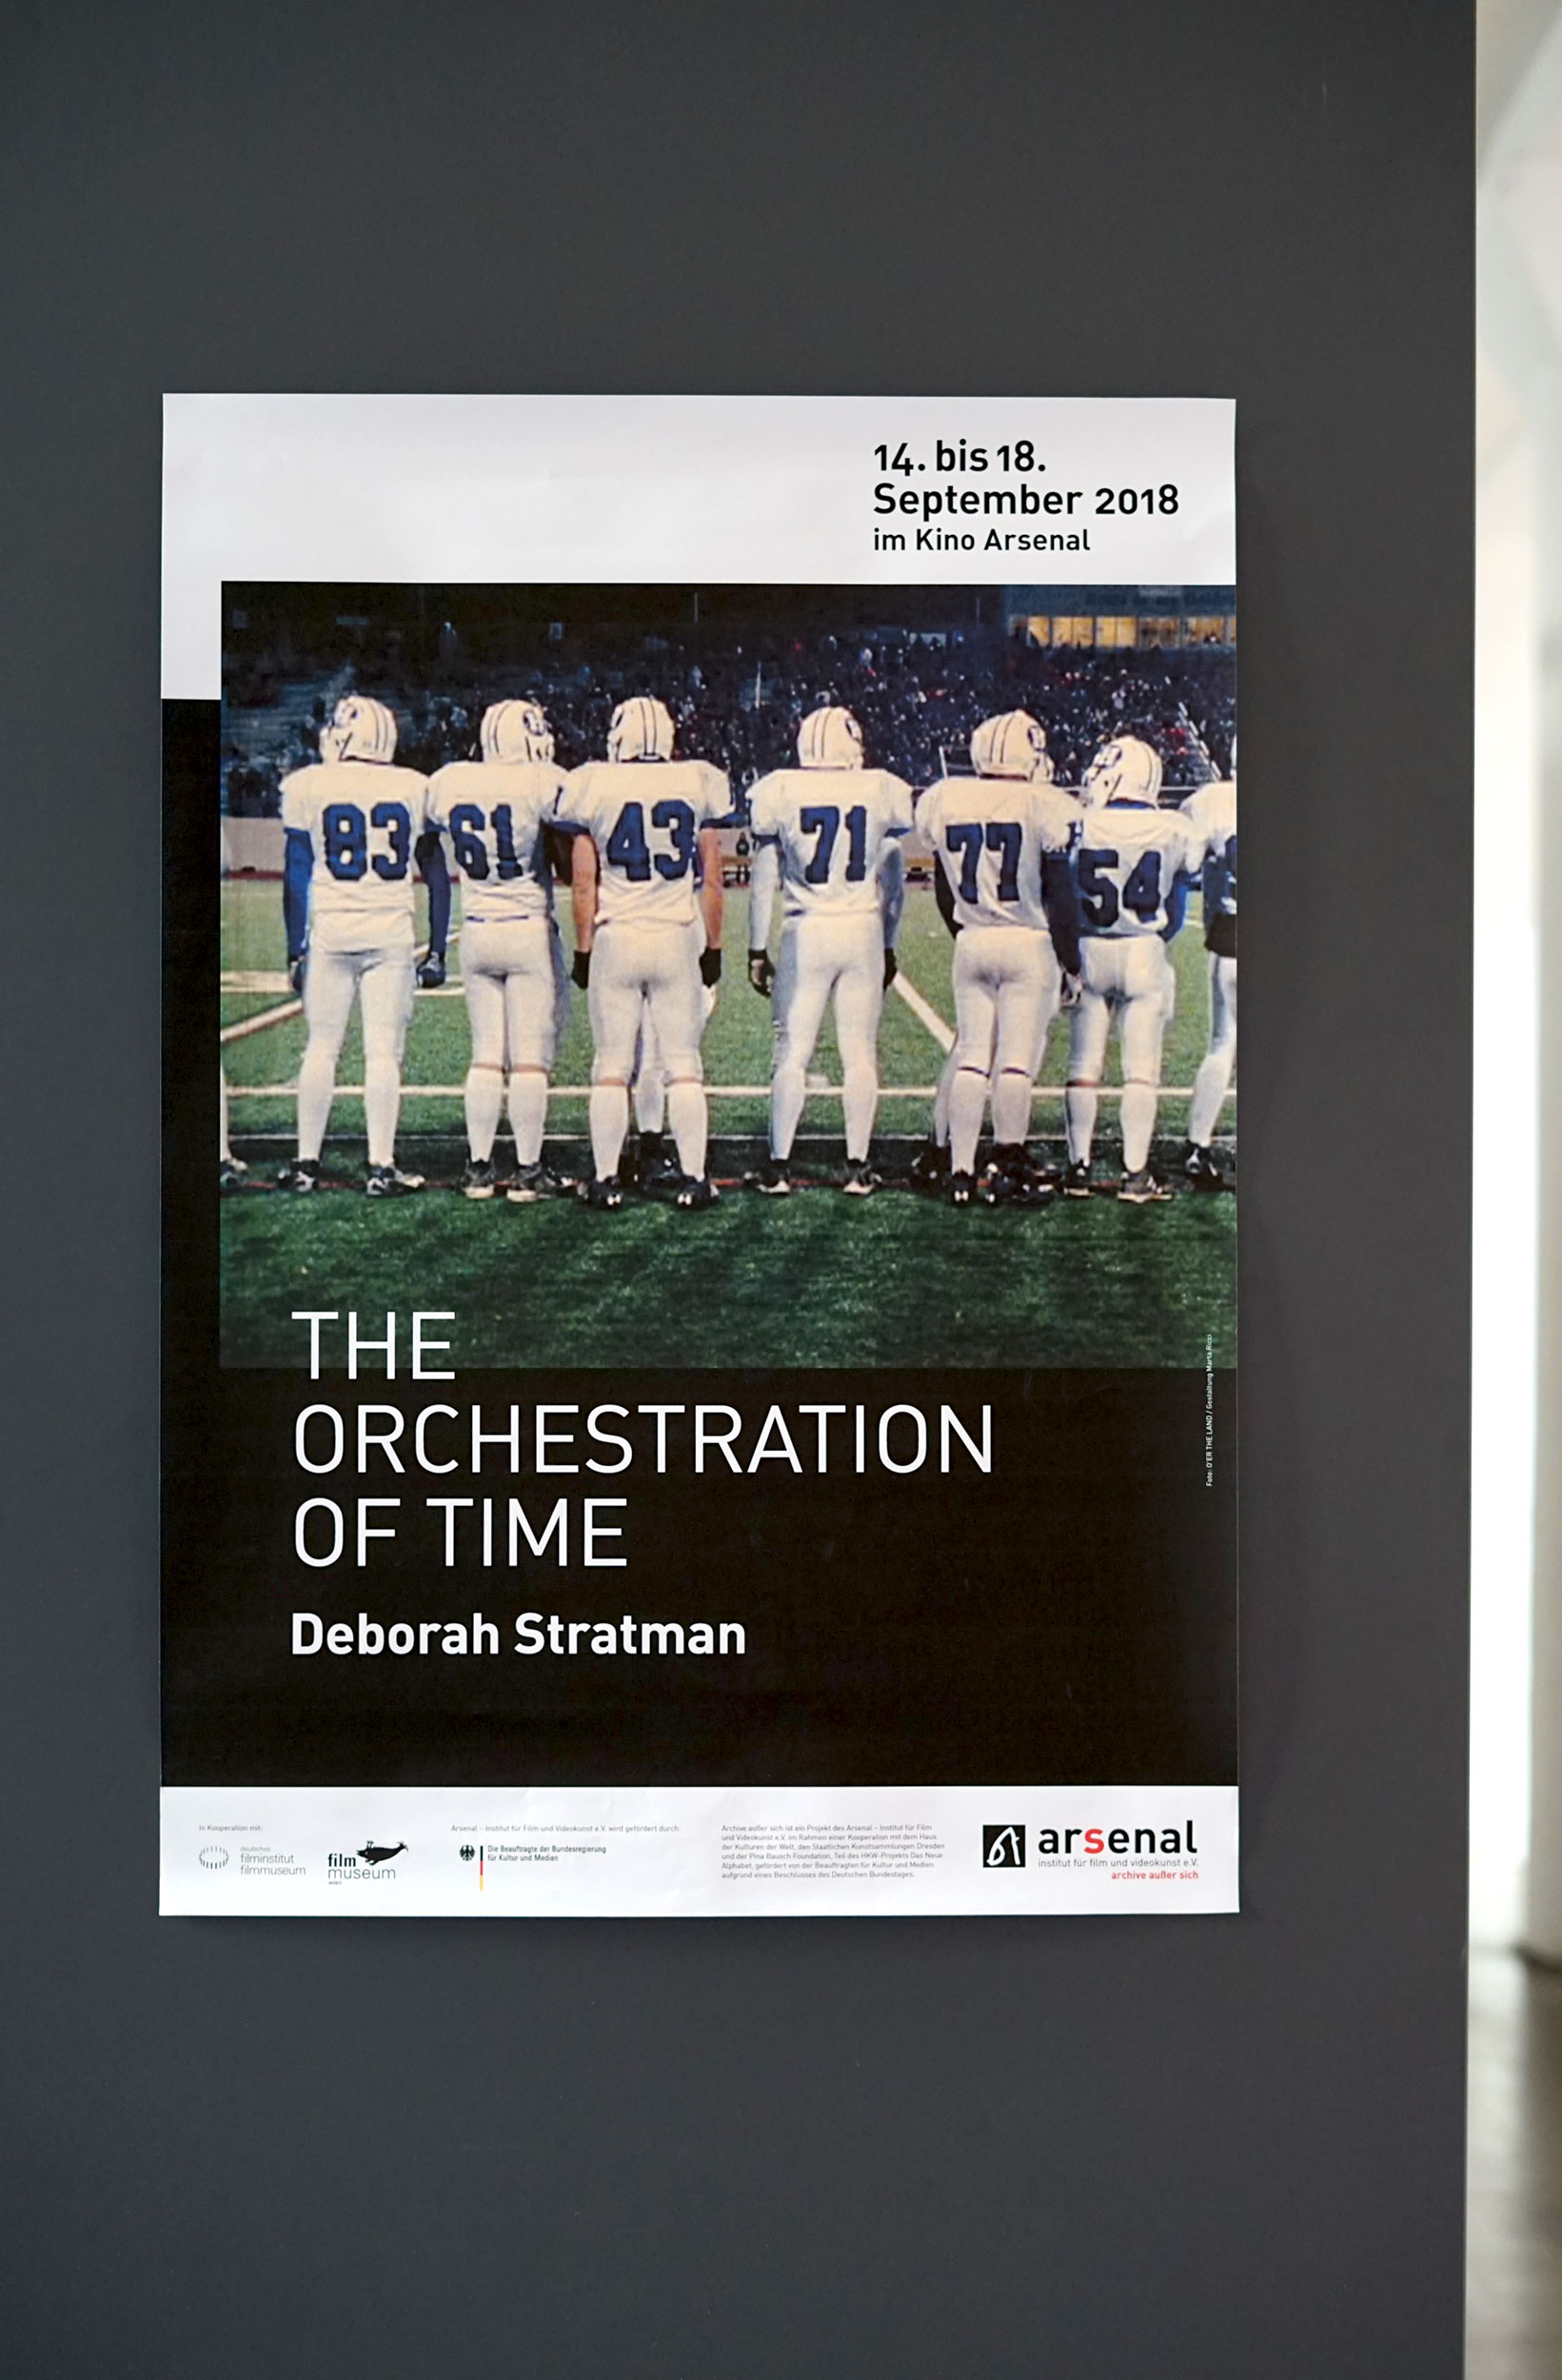 Arsenal Deborah Stratman - MartaRicciDesign